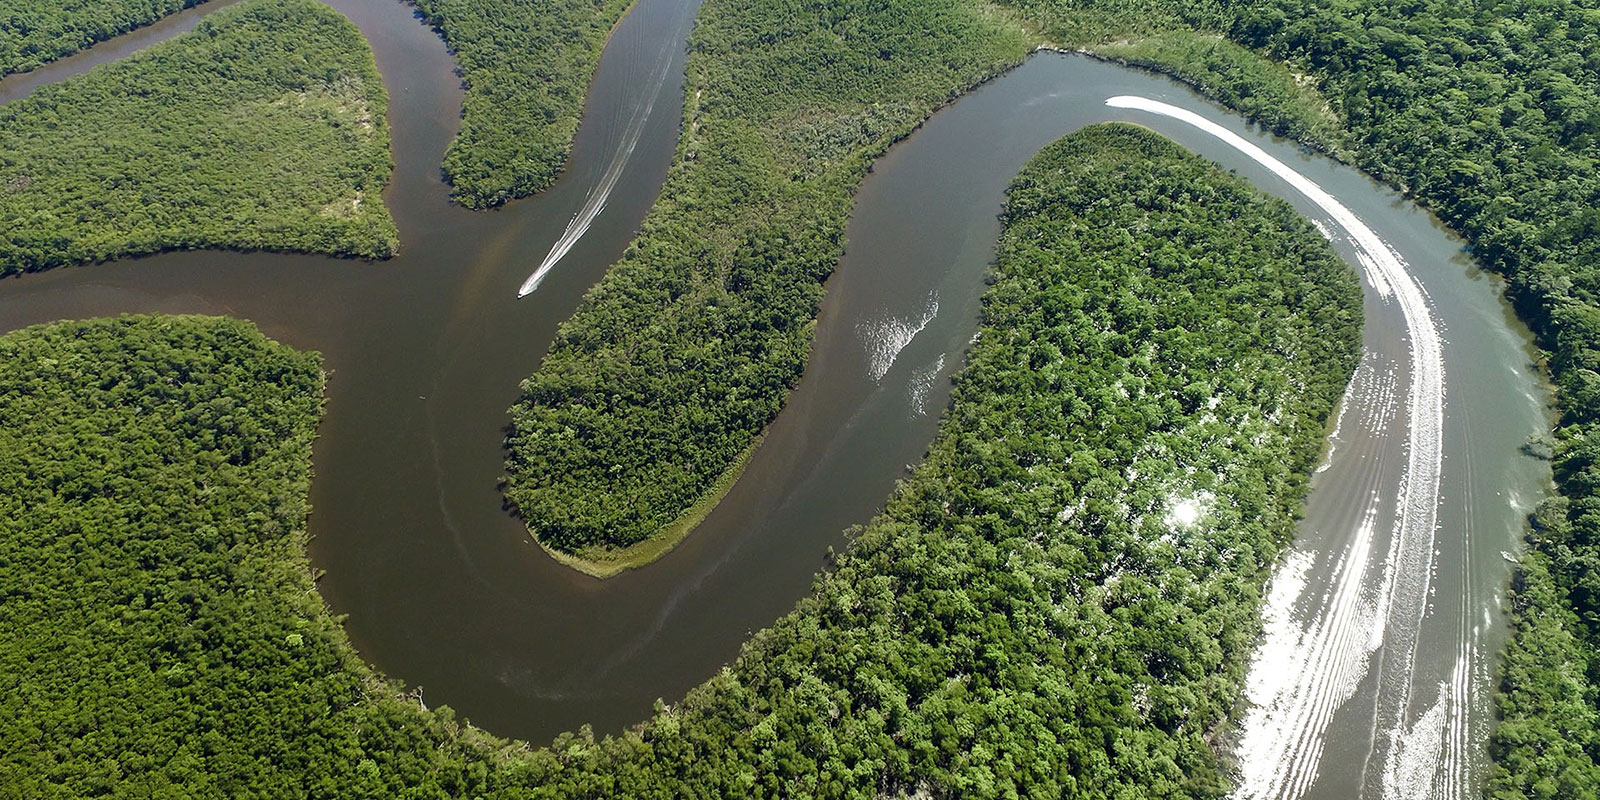 Amazonas Brasilien, Flitterwochen Abenteuer, Brasilien Rundreise 2 Wochen, Rundreise ARGENTINIEN BRASILIEN, individuelle Rundreise ARGENTINIEN BRASILIEN, Mietwagenrundreise ARGENTINIEN BRASILIEN, Reise ARGENTINIEN BRASILIEN, erlebe ARGENTINIEN BRASILIEN, Selbstfahrer ARGENTINIEN BRASILIEN, Kleingruppenreise ARGENTINIEN BRASILIEN, ARGENTINIEN BRASILIEN auf eigene Faust, Gruppenreise ARGENTINIEN BRASILIEN, Urlaub in ARGENTINIEN BRASILIEN, Ferien in ARGENTINIEN BRASILIEN, Familienreise ARGENTINIEN BRASILIEN, Flitterwochen ARGENTINIEN BRASILIEN, Hochzeitsreise ARGENTINIEN BRASILIEN